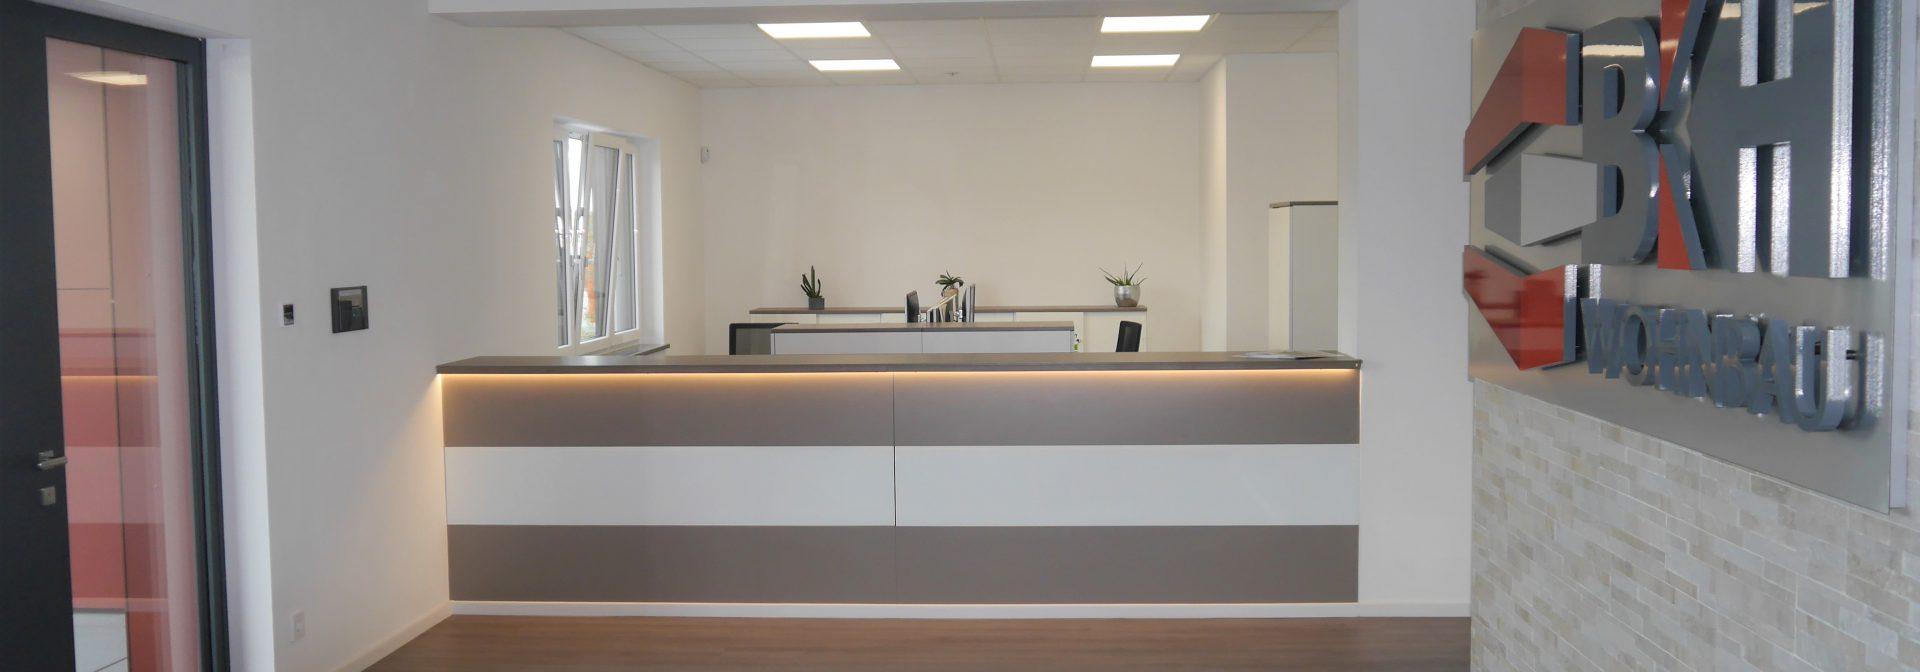 Büro Innen 02_300819